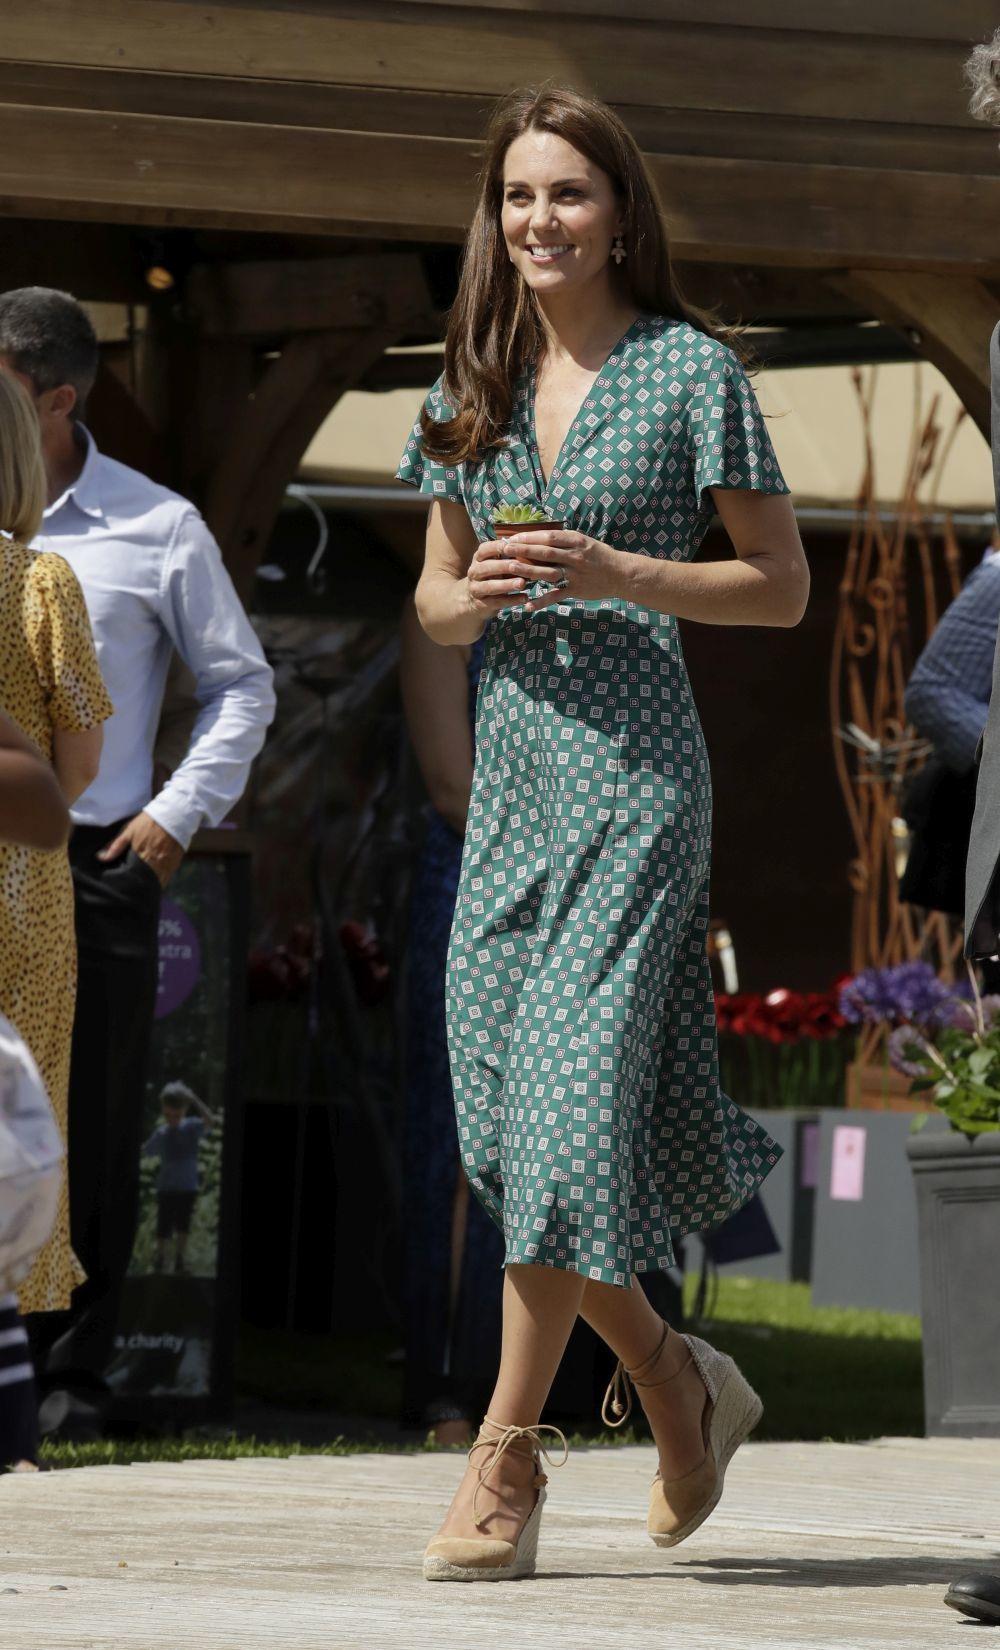 La Duquesa de Cambridge vuelve a lucir unas alpargatas de Castañer.